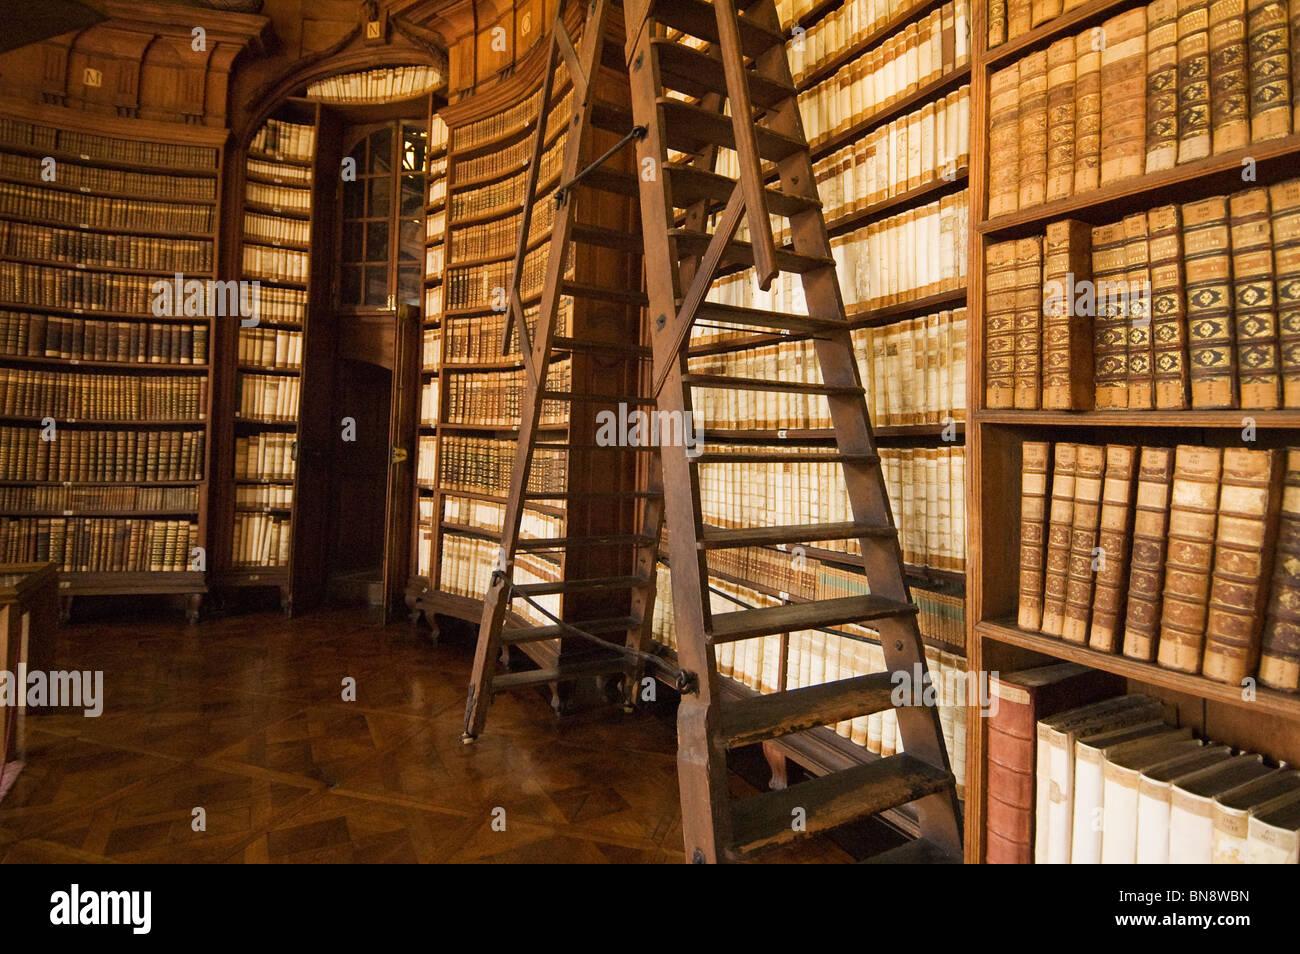 Elk190 3053 Hungary Eger Lyceum Library 1778 Antique Books